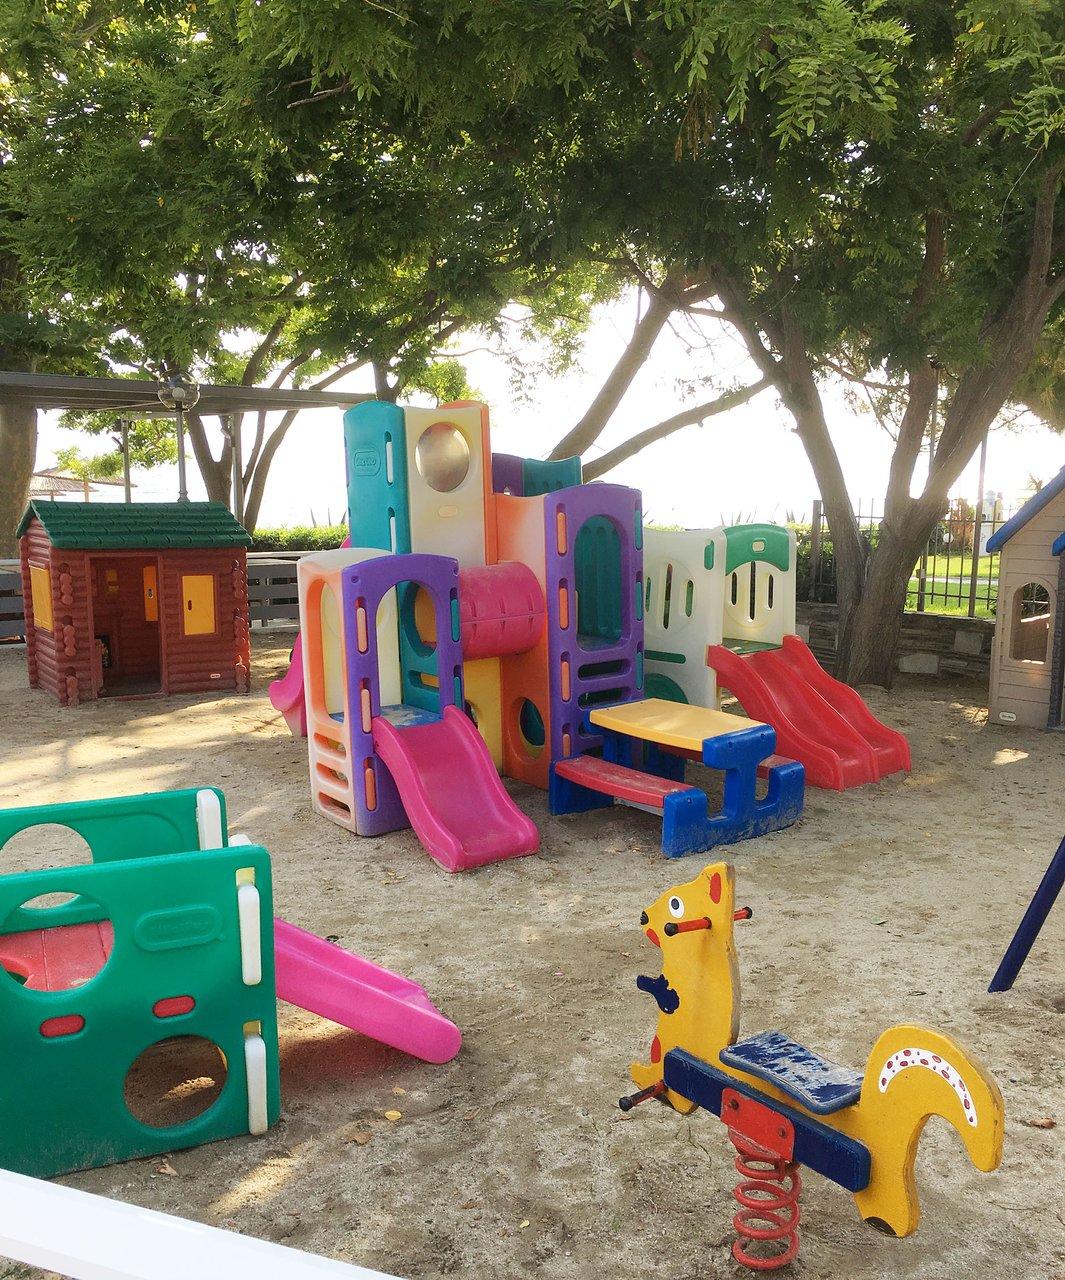 Naias Hotel Updated 2018 Prices Reviews Hanioti Halkidiki Fuse Box Tripadvisor